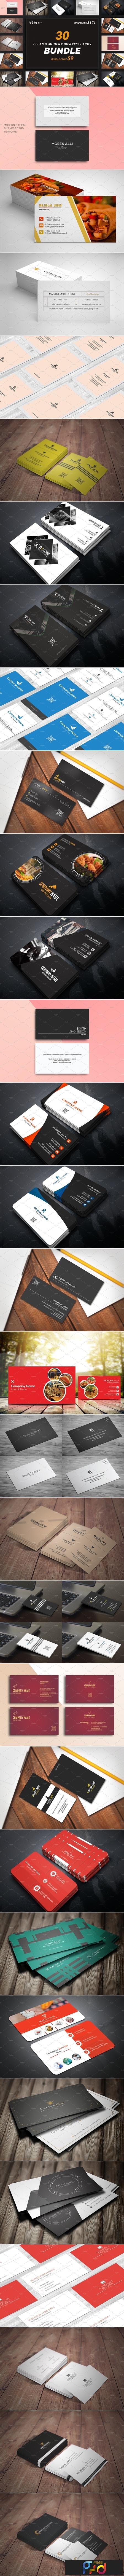 30 Business Cards Bundle 3297958 1